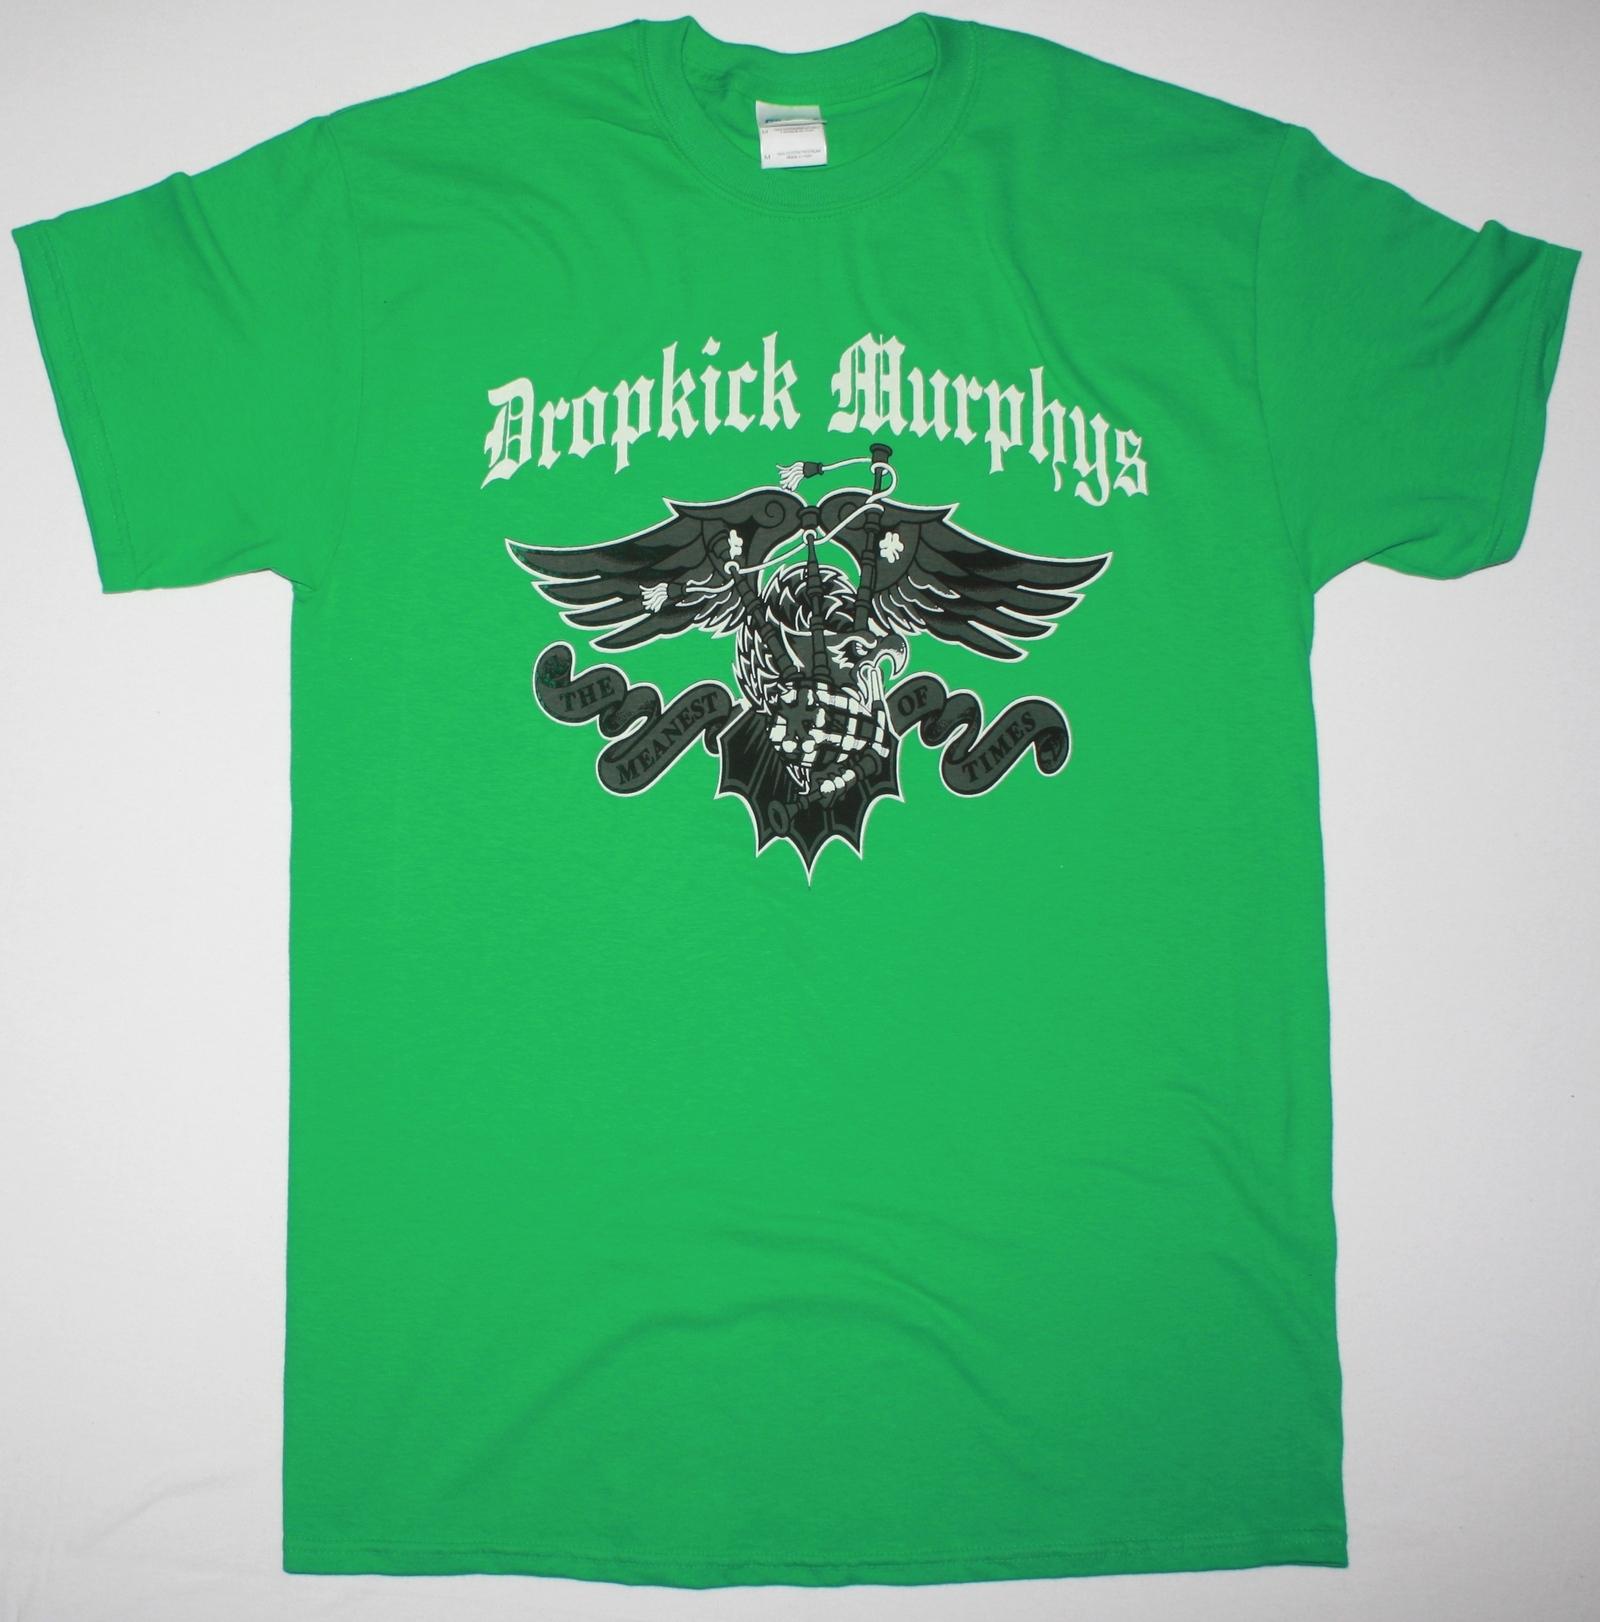 DROPKICK MURPHYS THE MEANEST OF TIMES NEW GREEN T-SHIRT